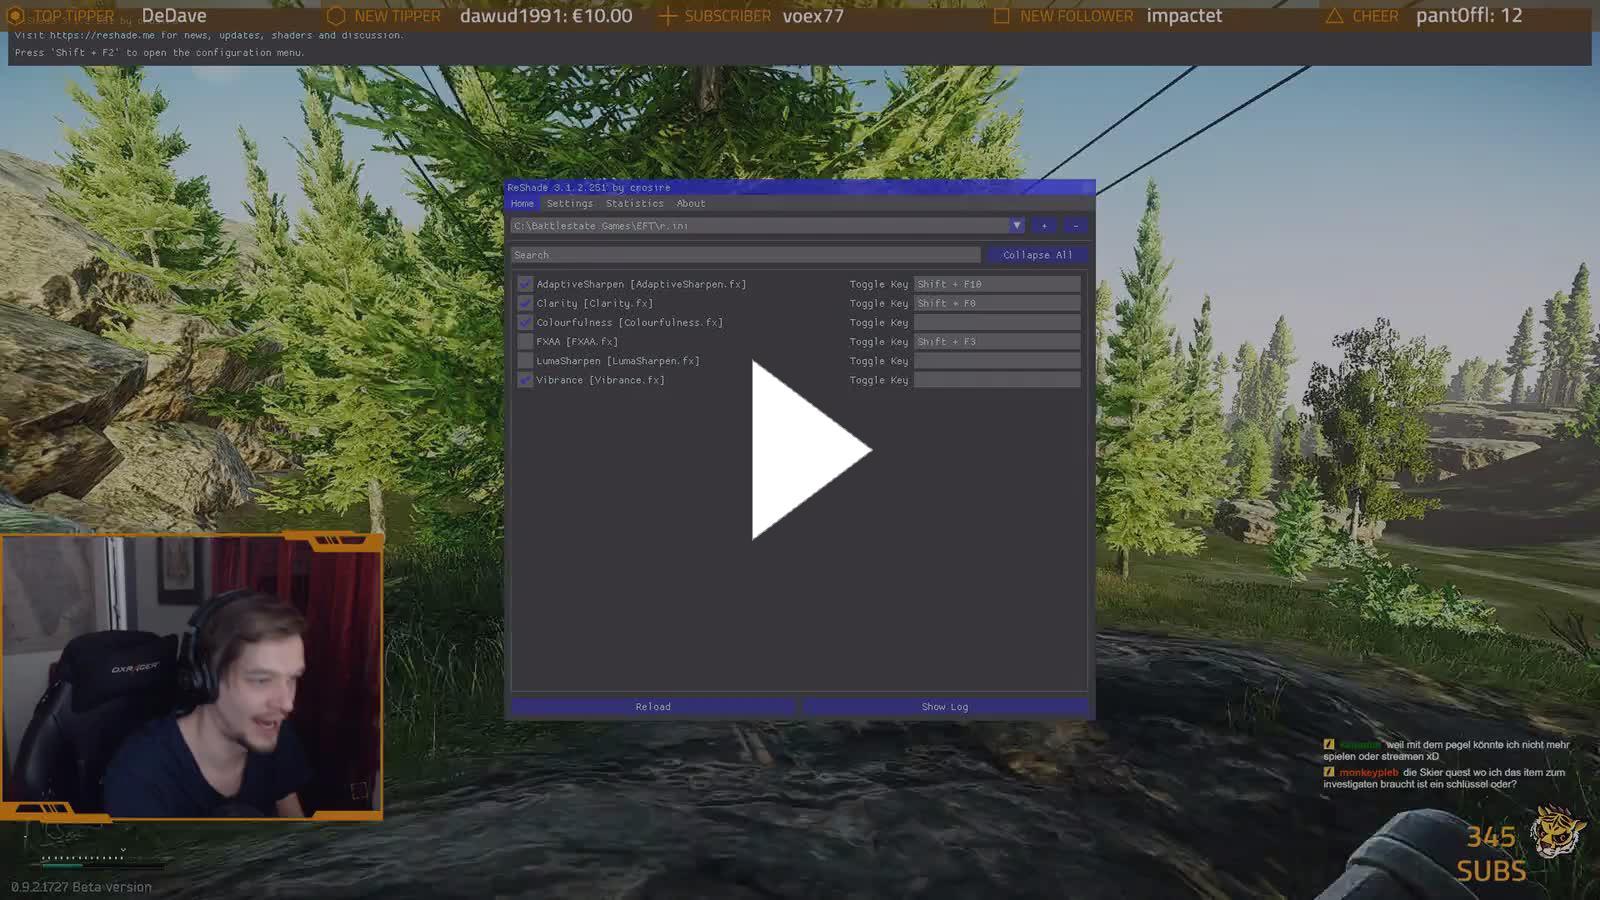 SkaavTV - reshade settings - Twitch